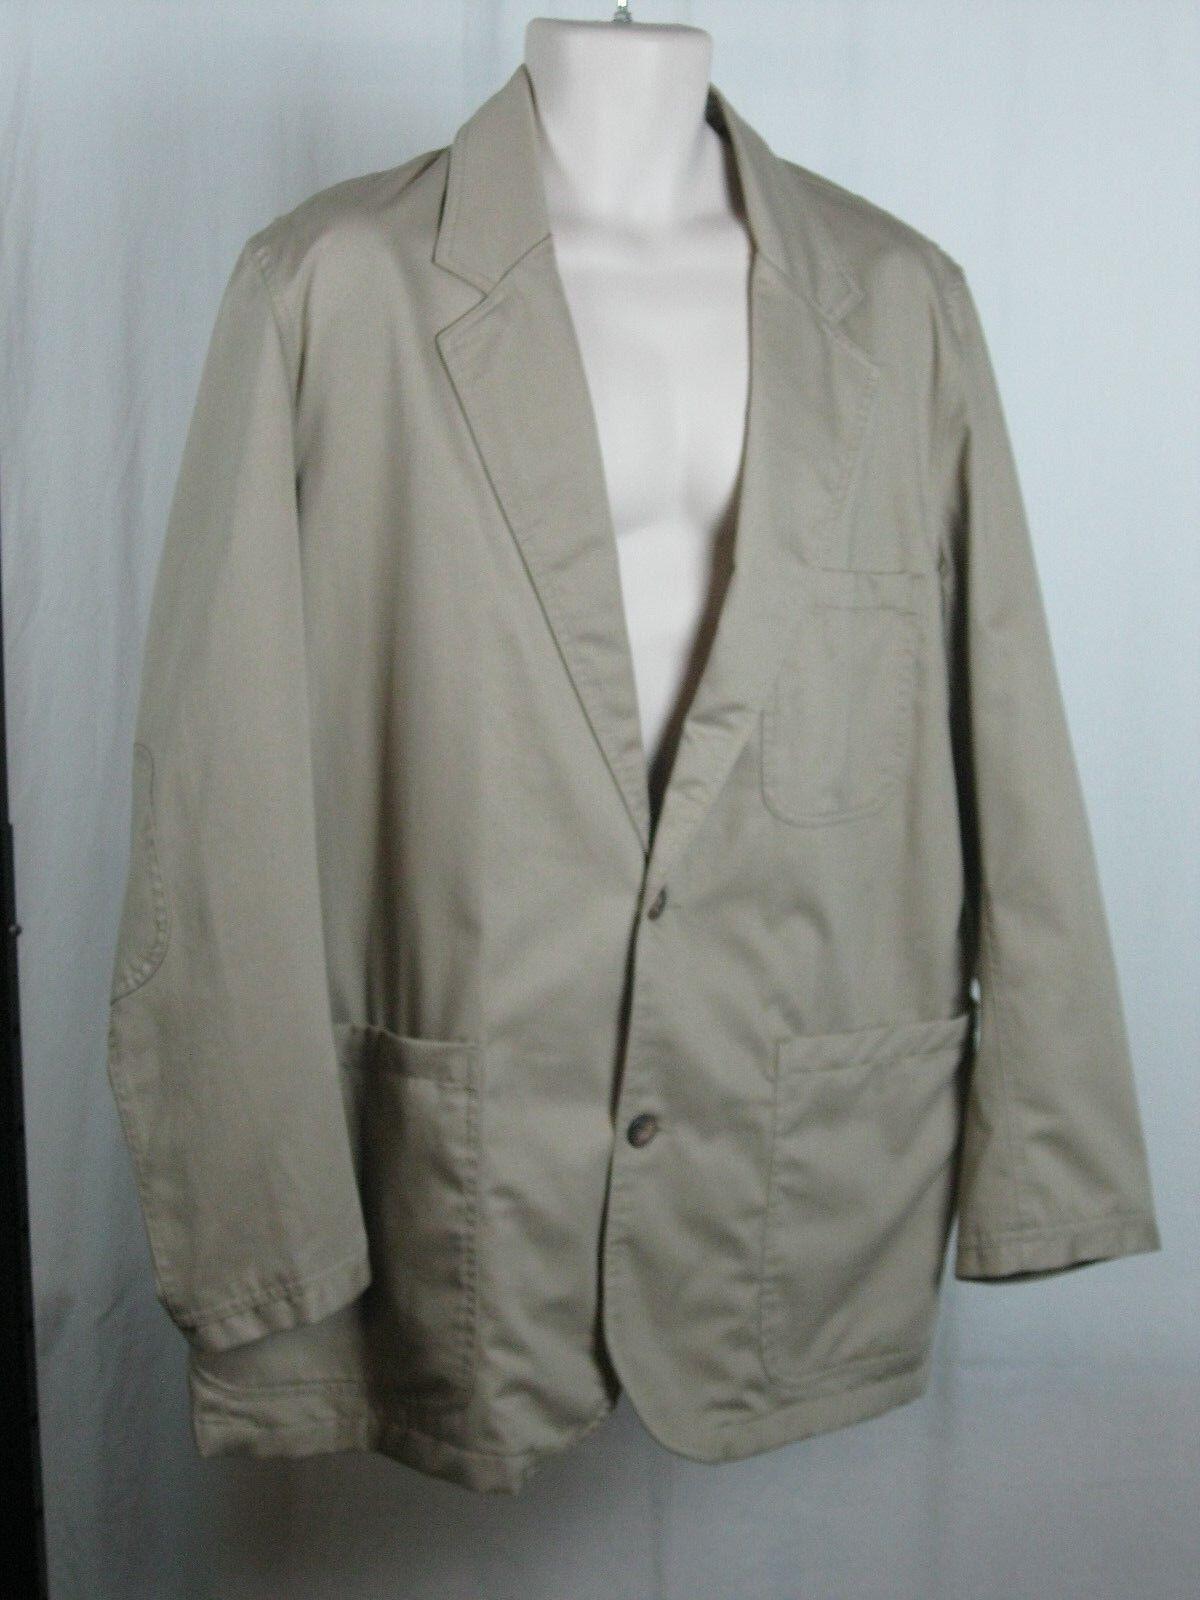 Duluth Trading Company Men's Presentation Khaki Blazer Sports Coat L Tall NWT